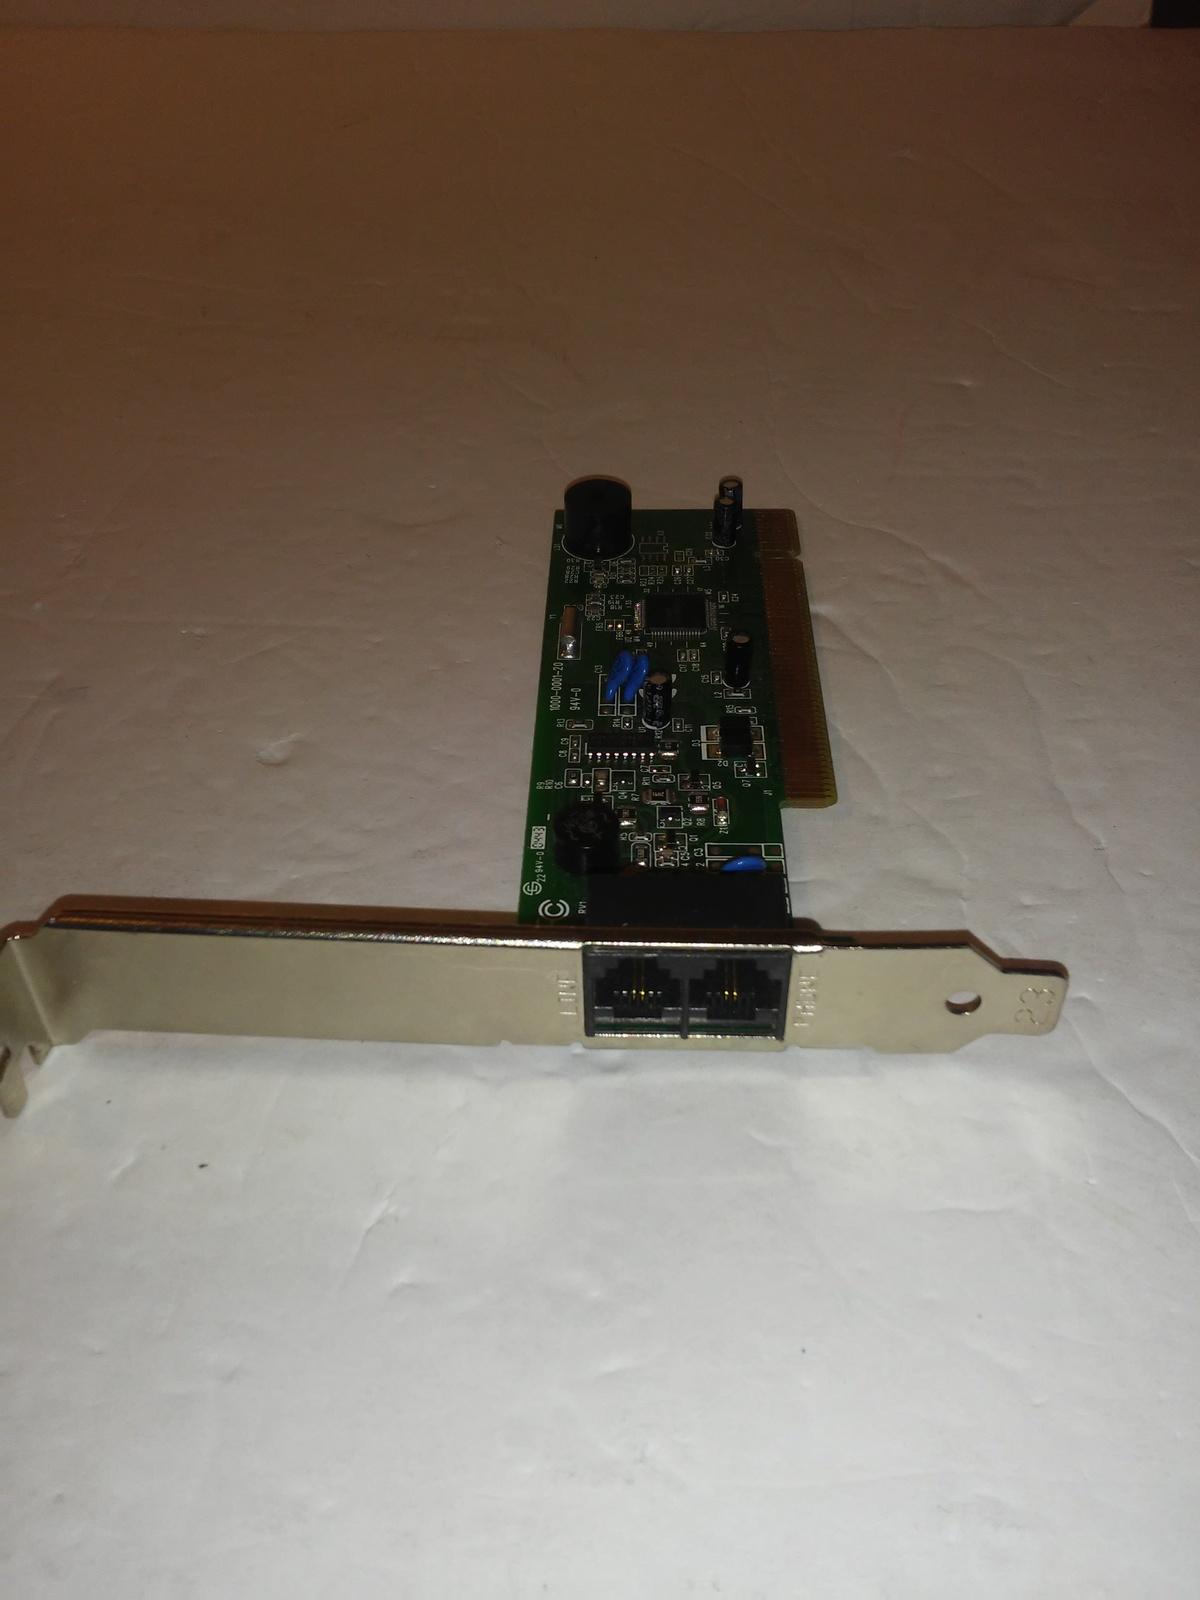 PCI CX11252 SOFT MODEM WINDOWS 7 64BIT DRIVER